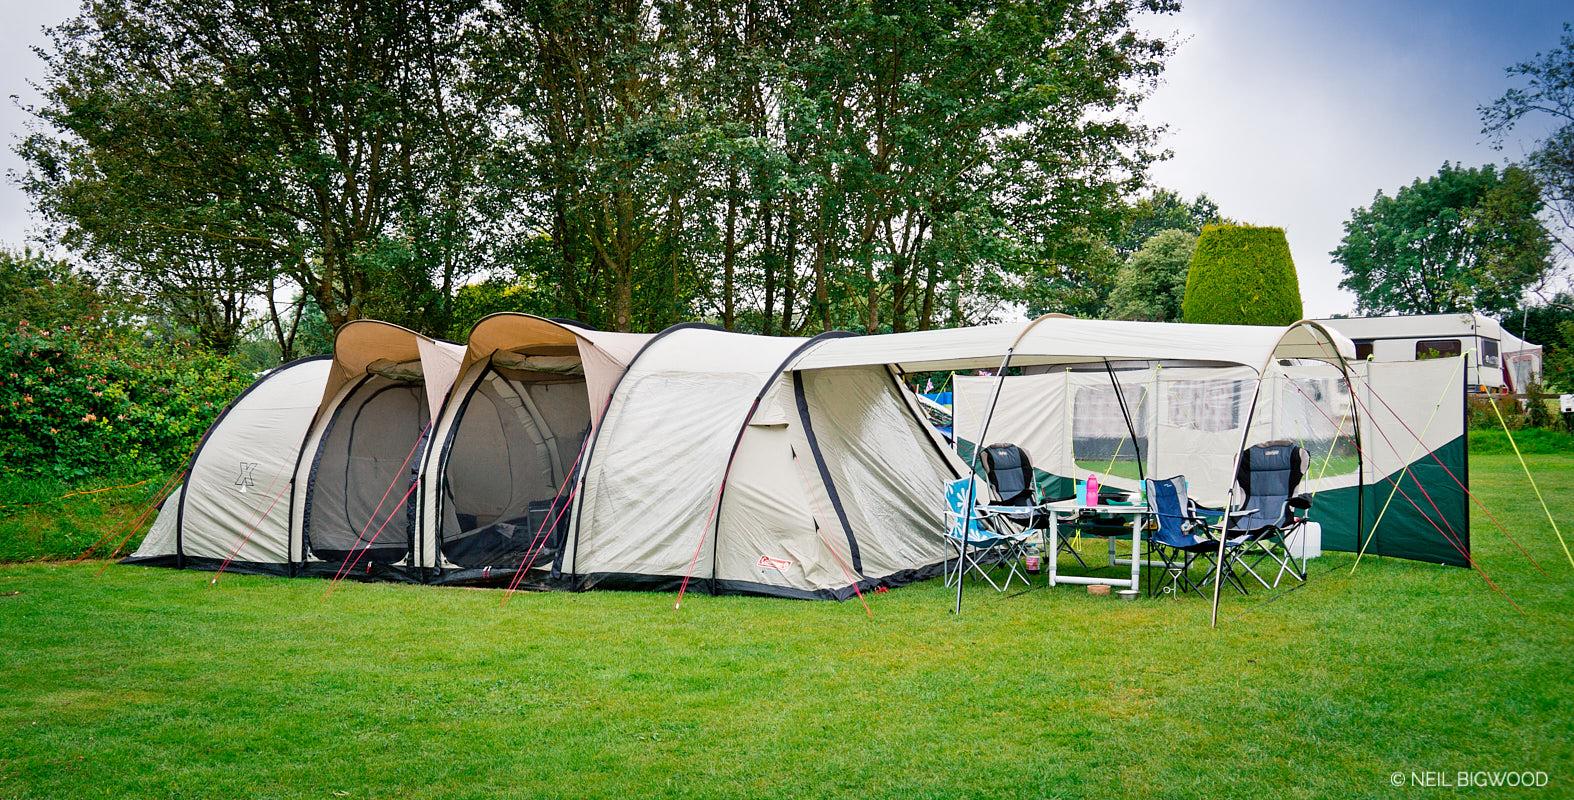 Neil-Bigwood-Monkton-Wyld-Camping-77